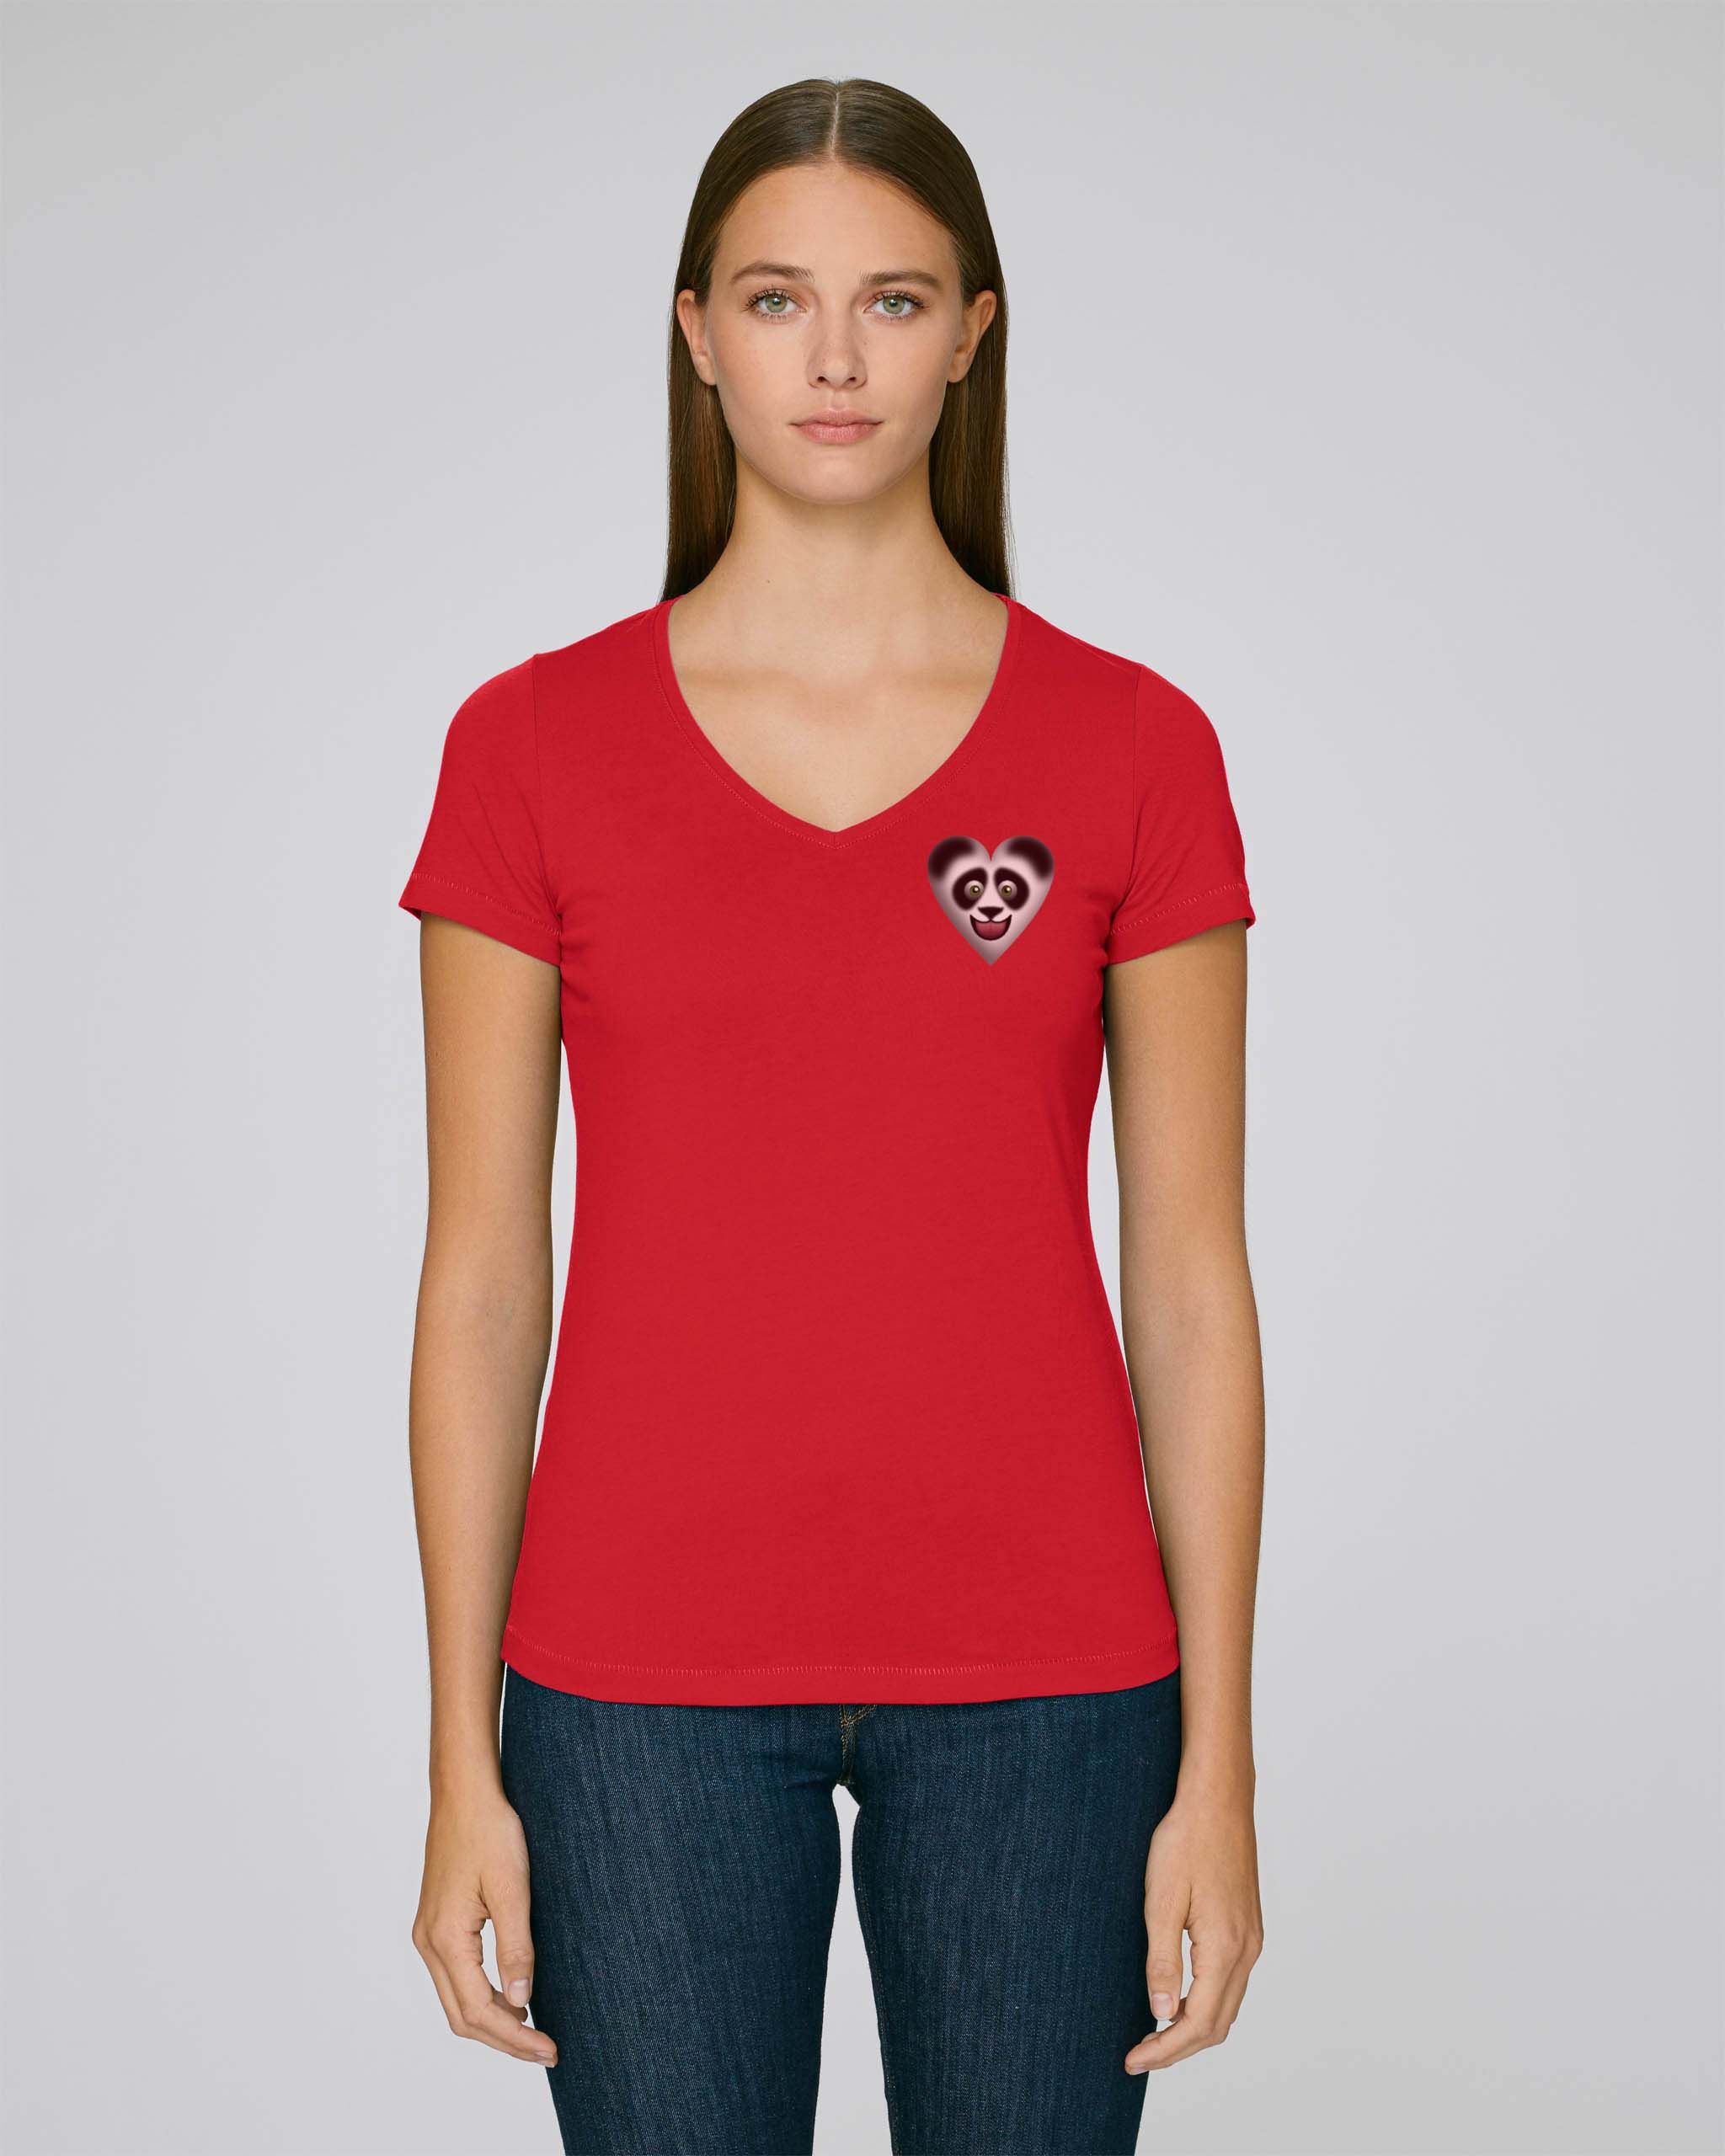 T-Shirt Bio rouge Femme – Panda tee